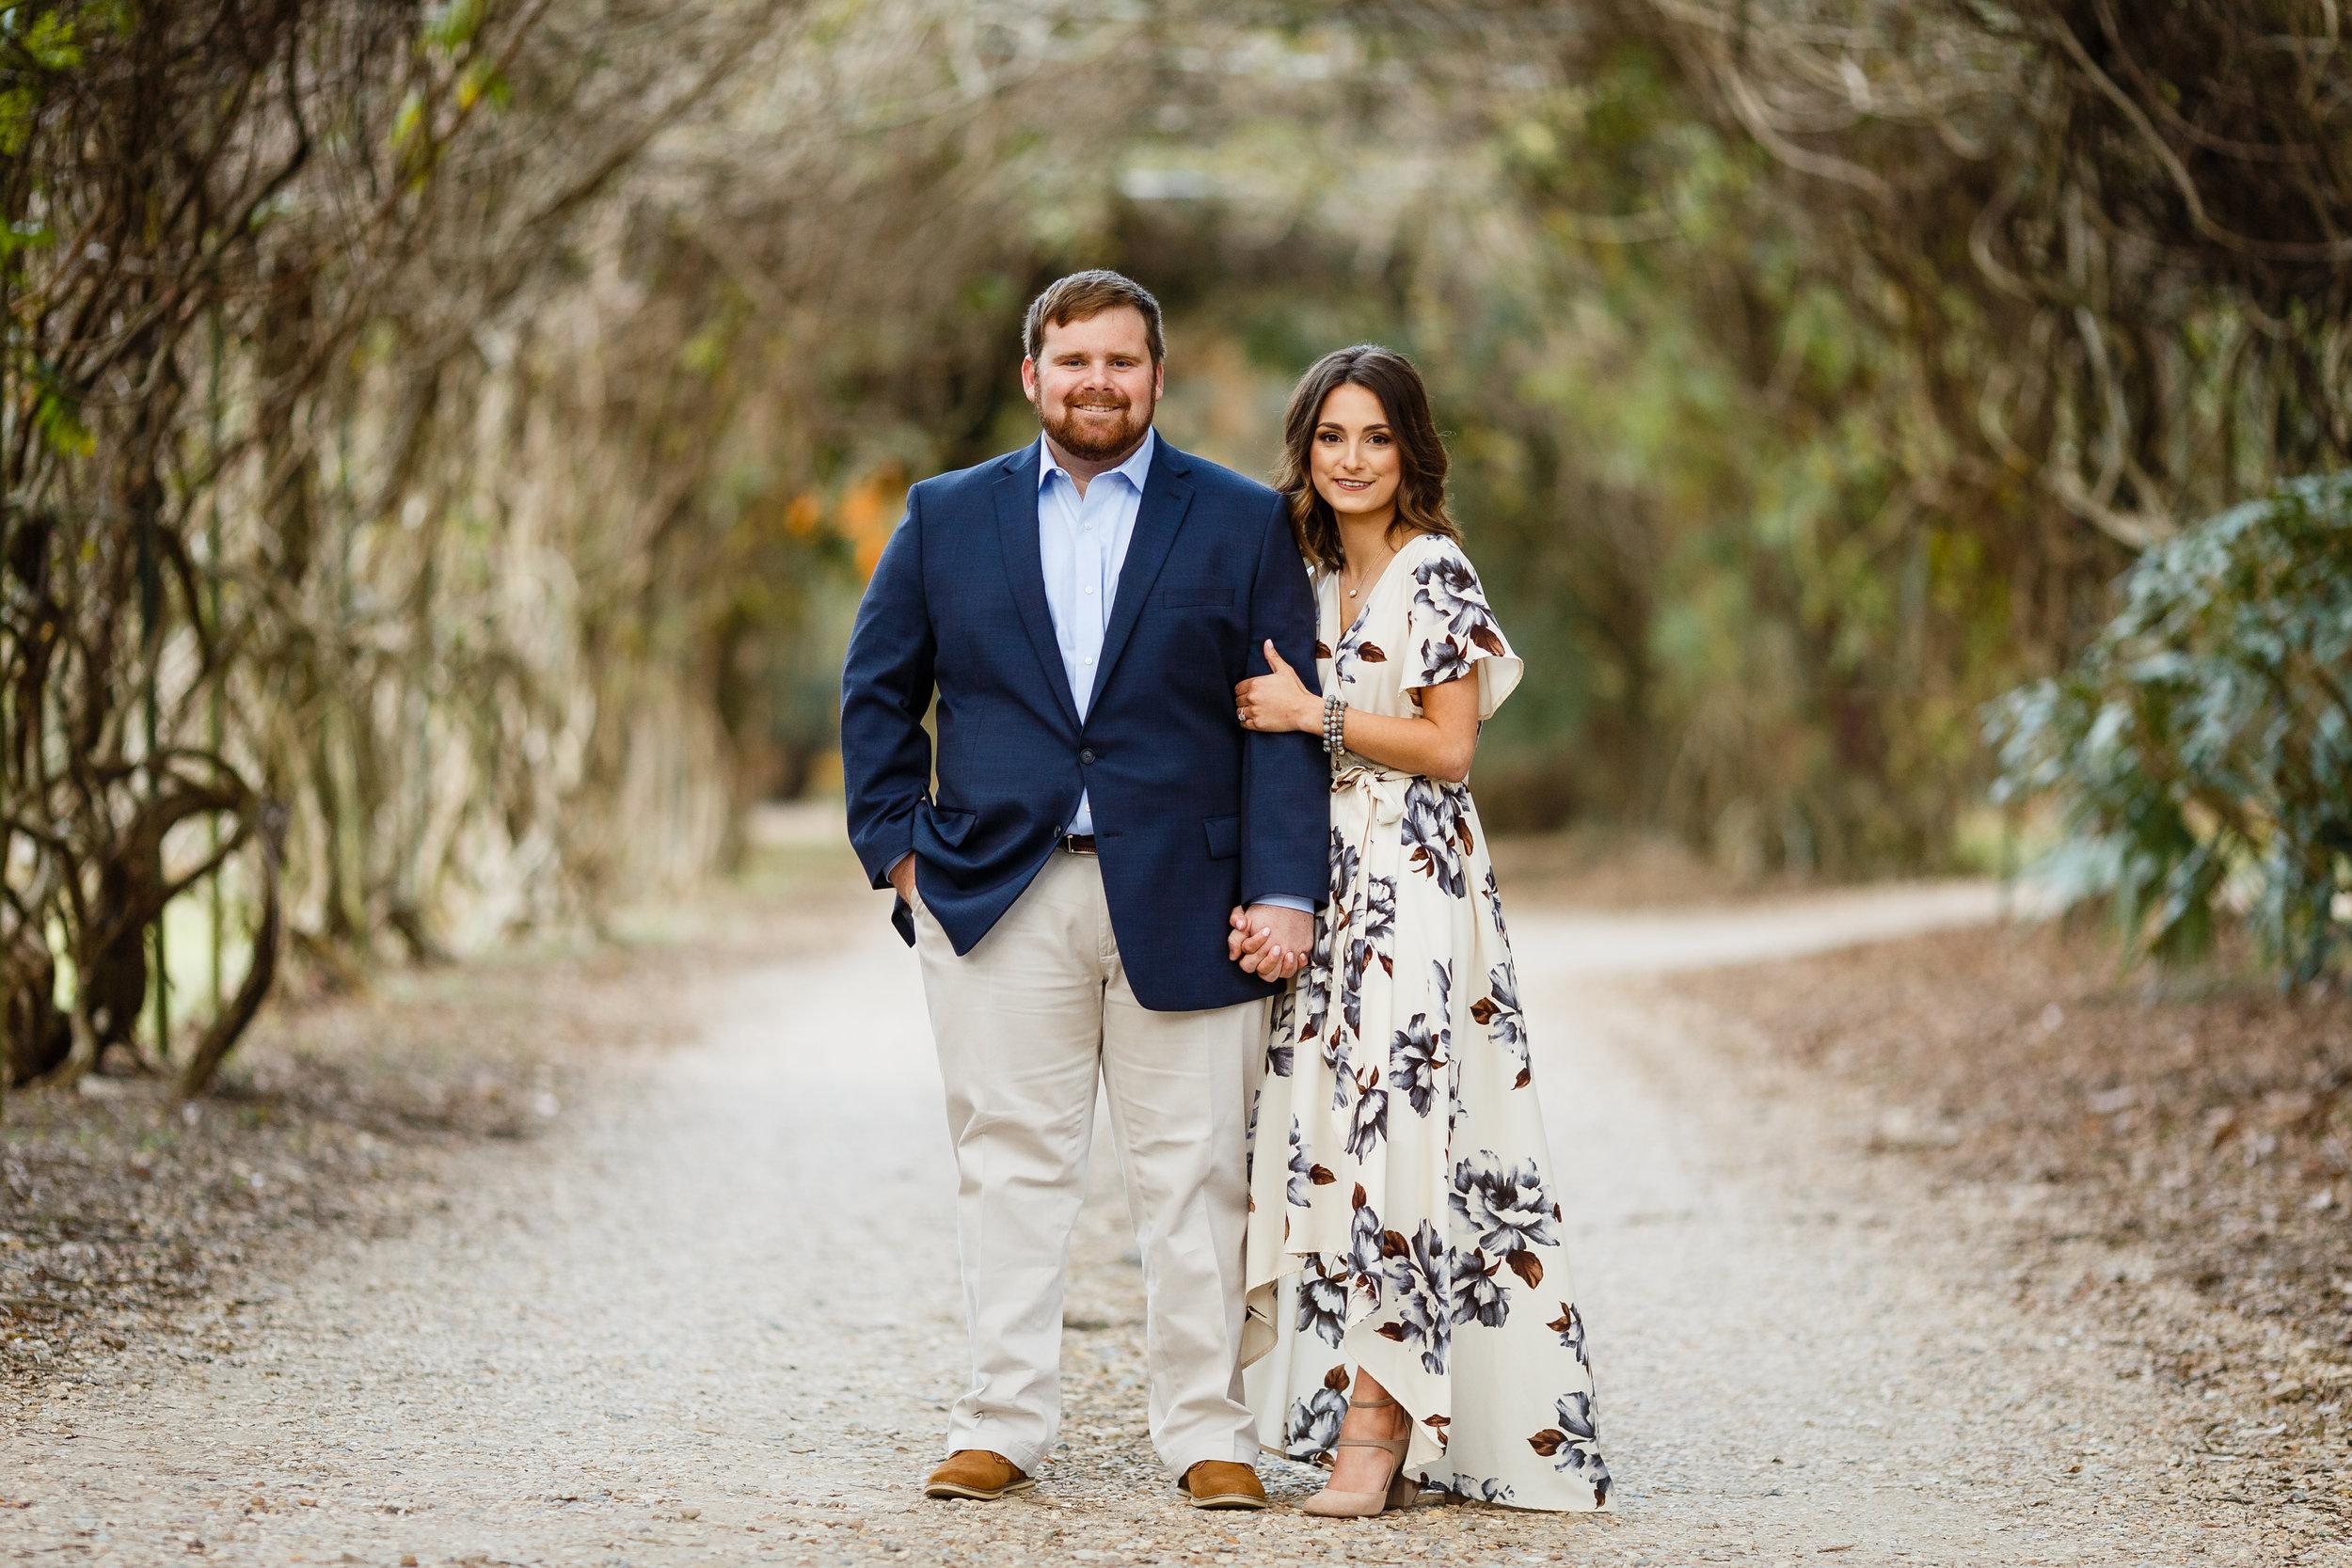 Youngsville-lafayette-portrait-family-wedding-photographer-9192.jpg